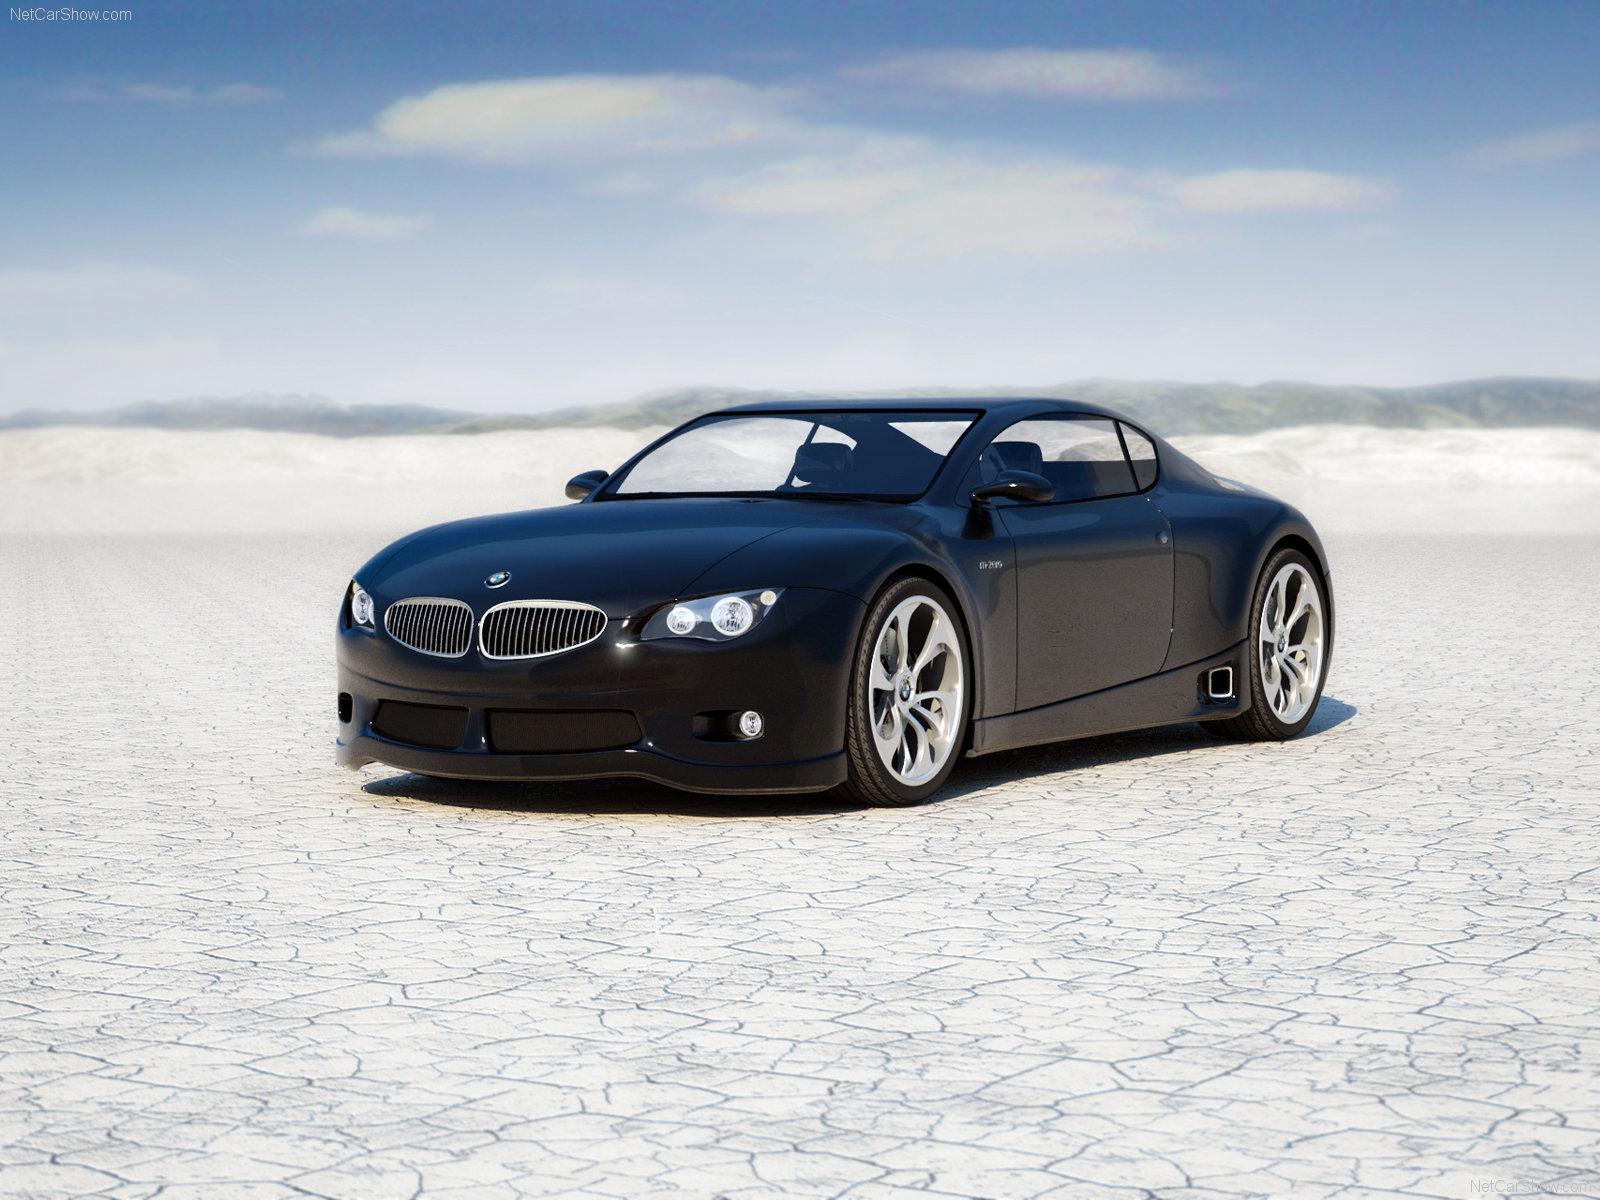 http://2.bp.blogspot.com/-XanGQMeS0og/TkGJItsV9YI/AAAAAAAAKpY/dliPnIGa000/s1600/BMW%20HQ%20Wallpaper%20%2872%29.jpg